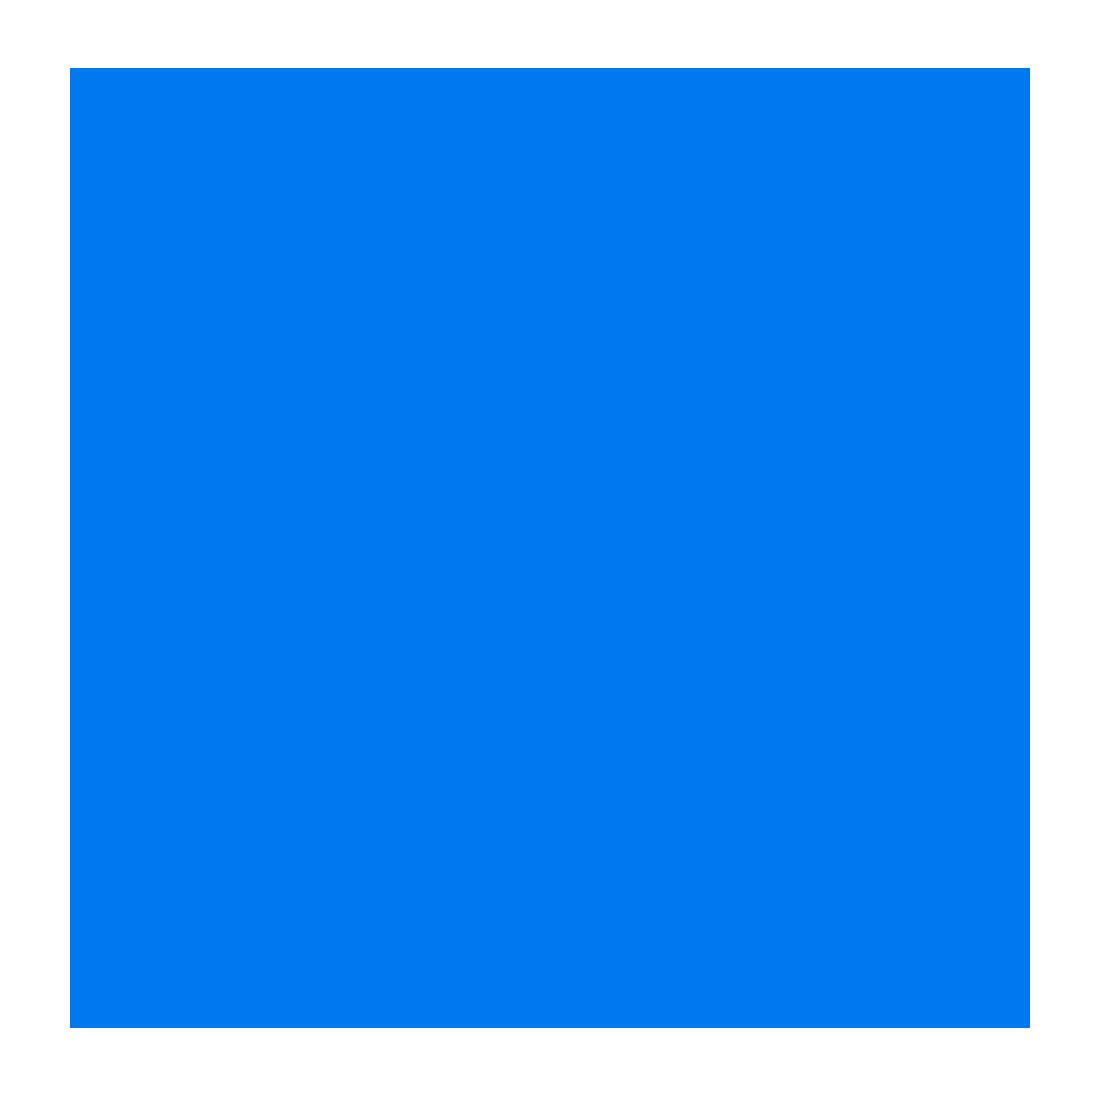 File:DC Comics logo.png.